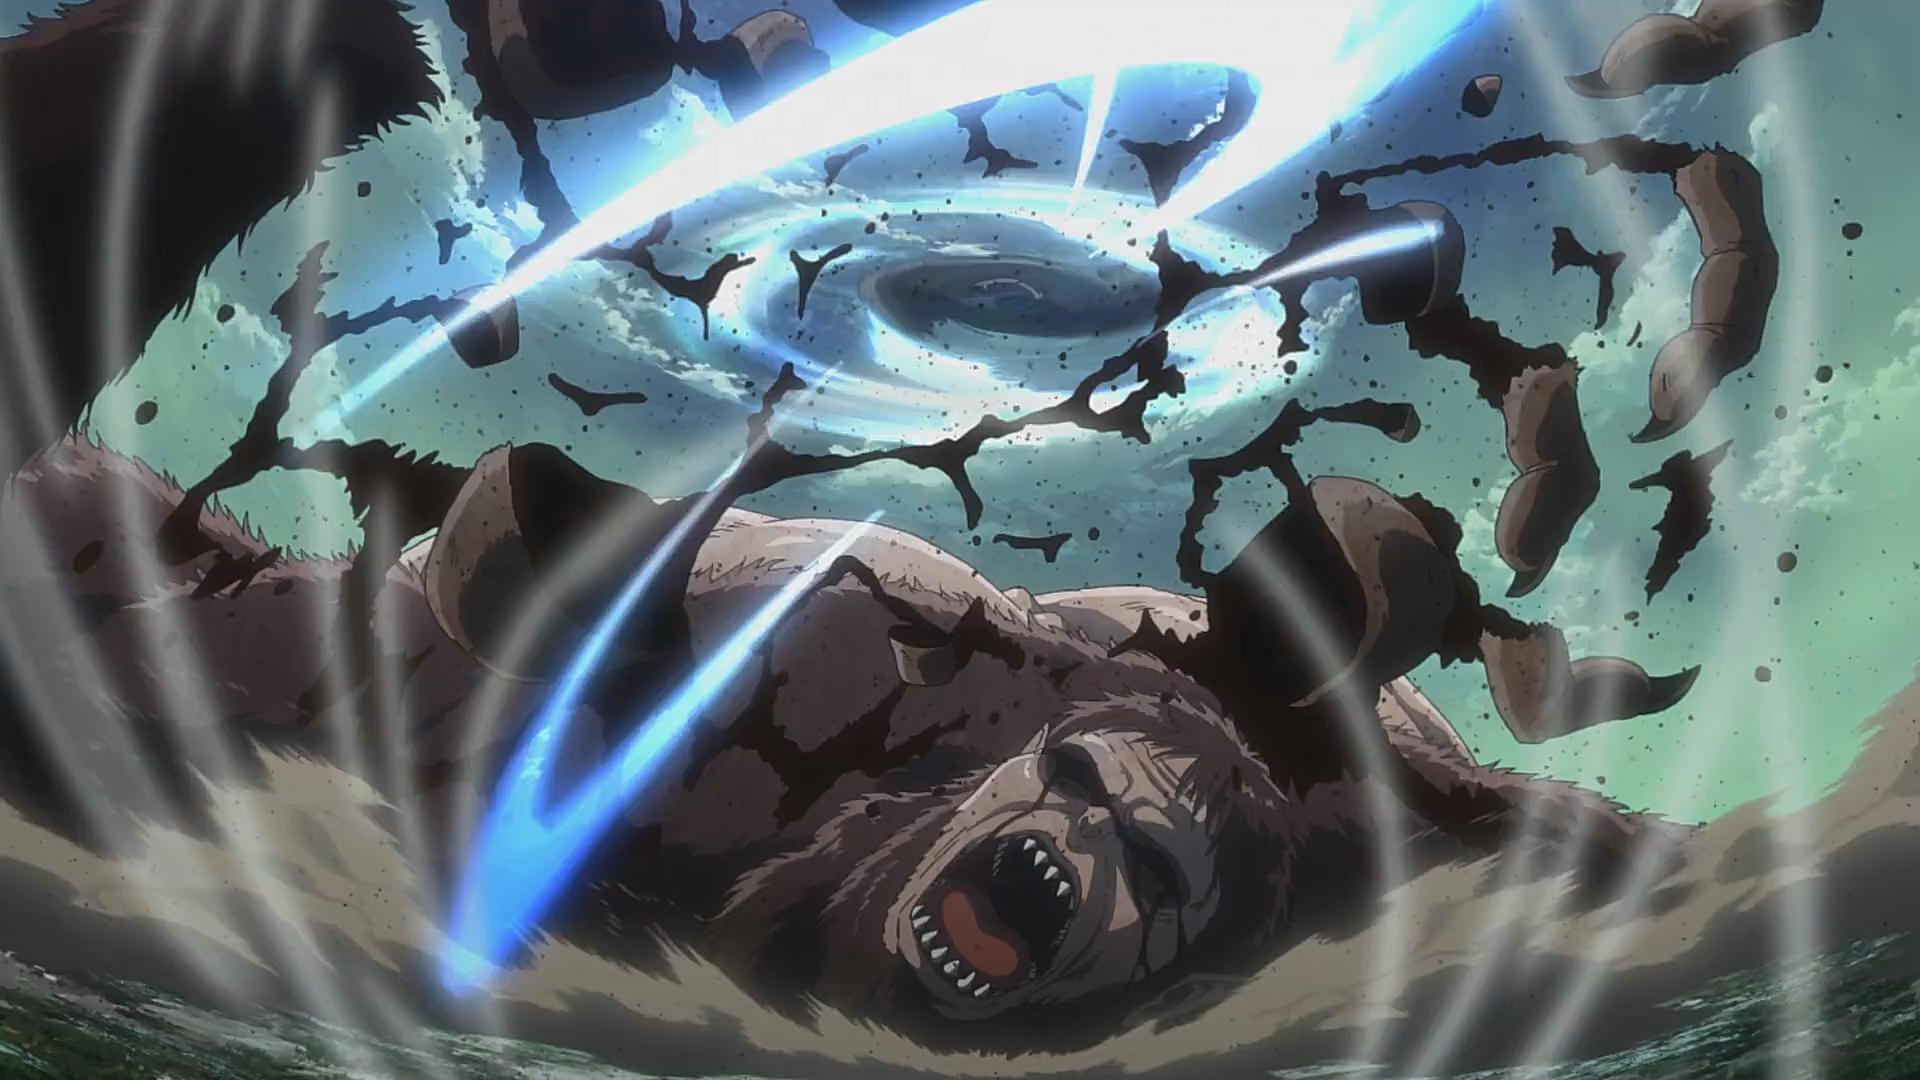 Beast Titan Anime Image Gallery Attack On Titan Wiki Fandom